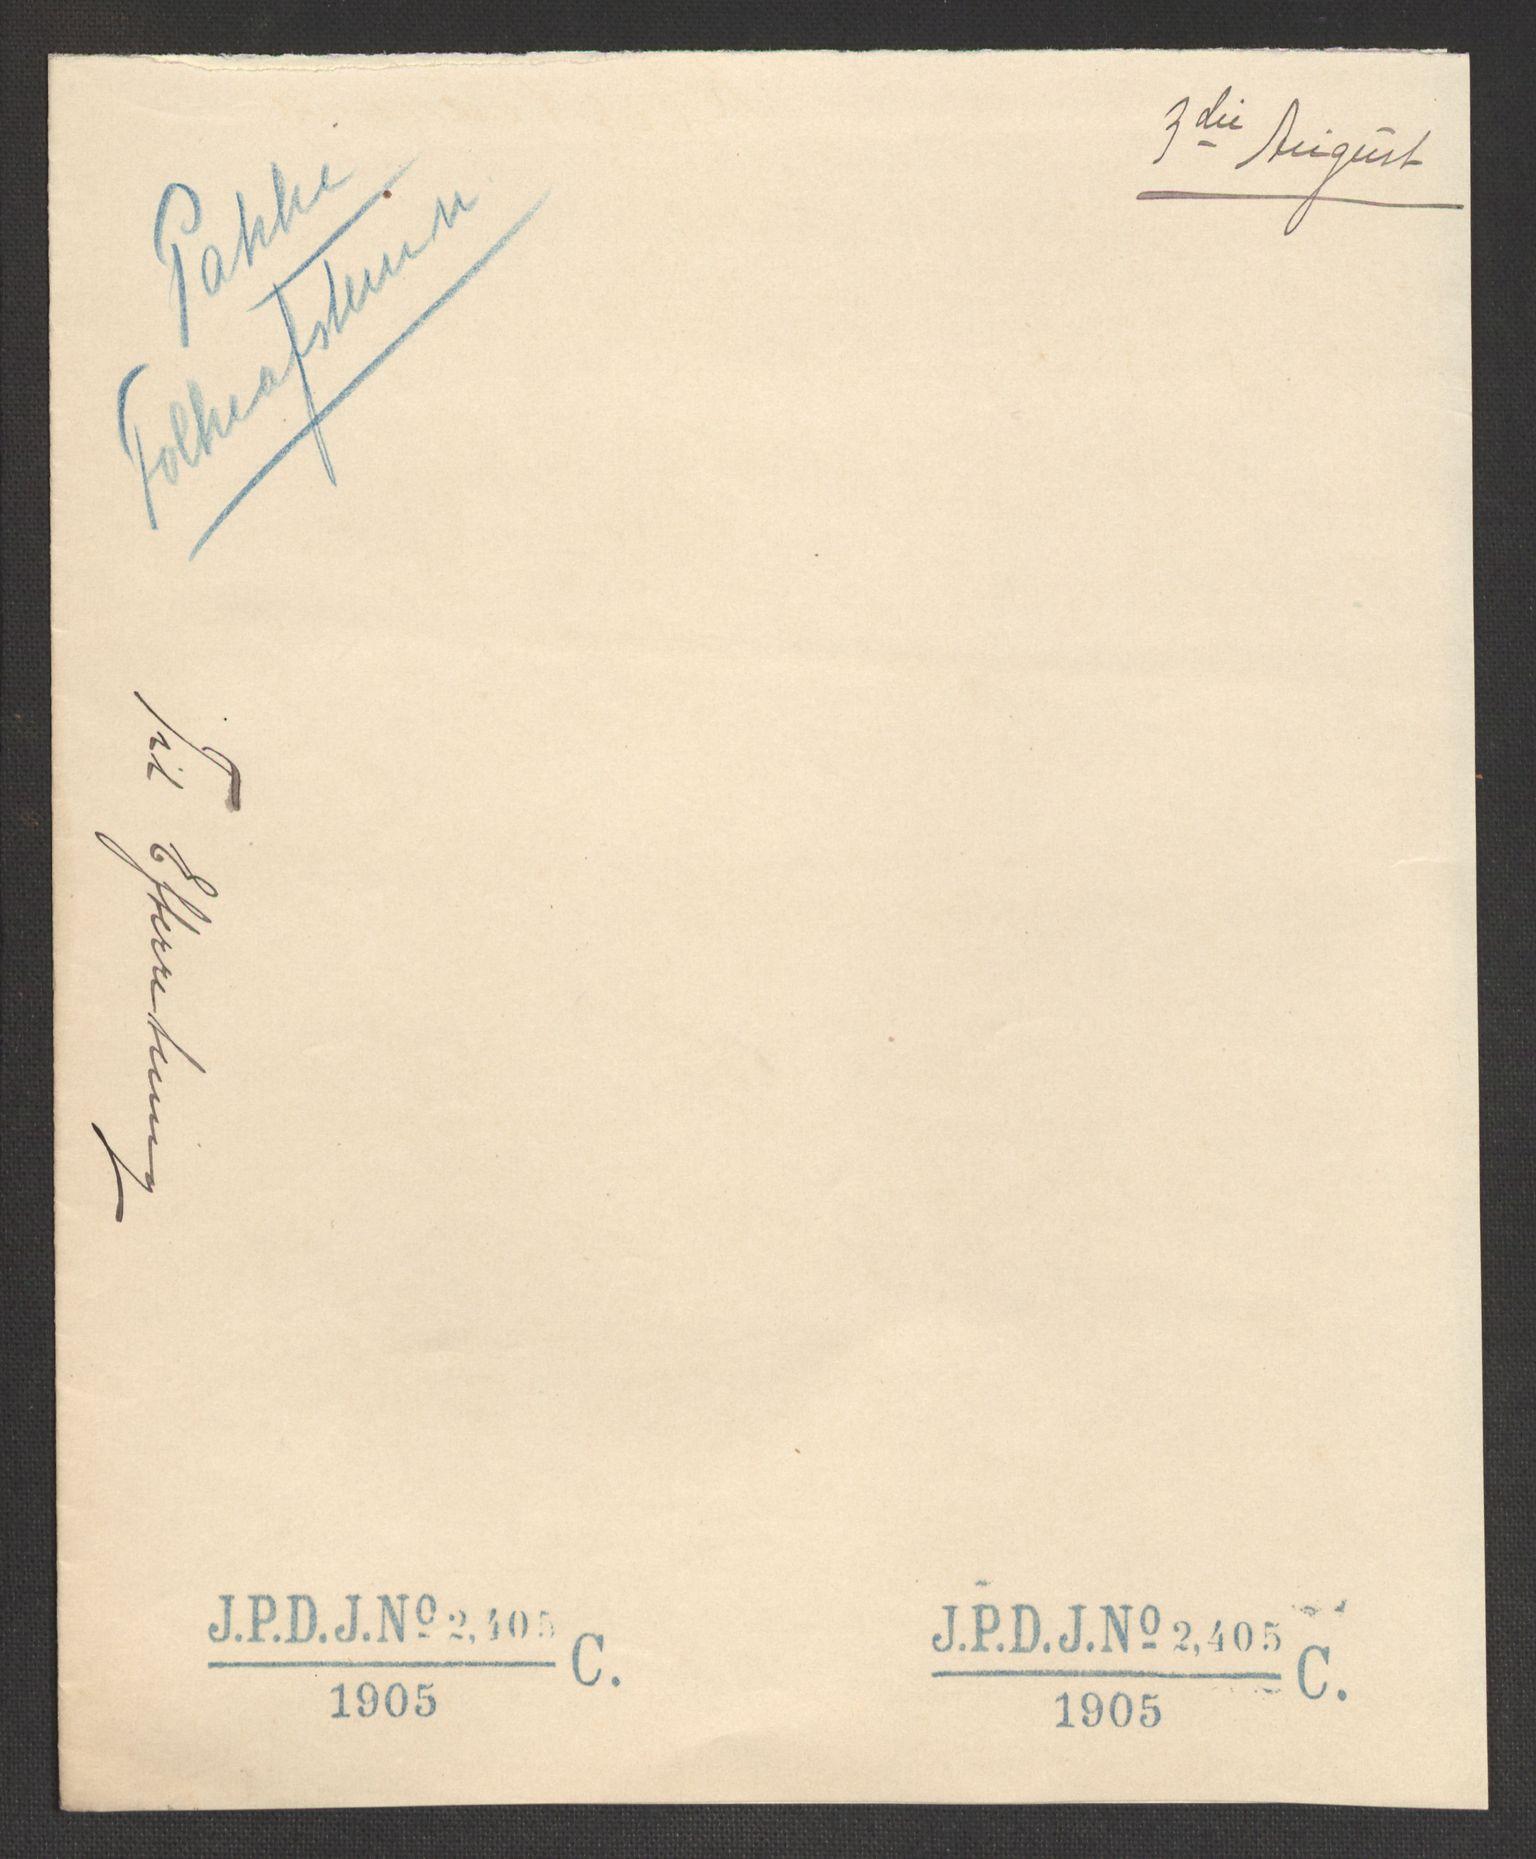 RA, Justisdepartementet, 2. sivilkontor C, F/L0125B: Folkeavstemmingen august 1905, 1905, s. 95